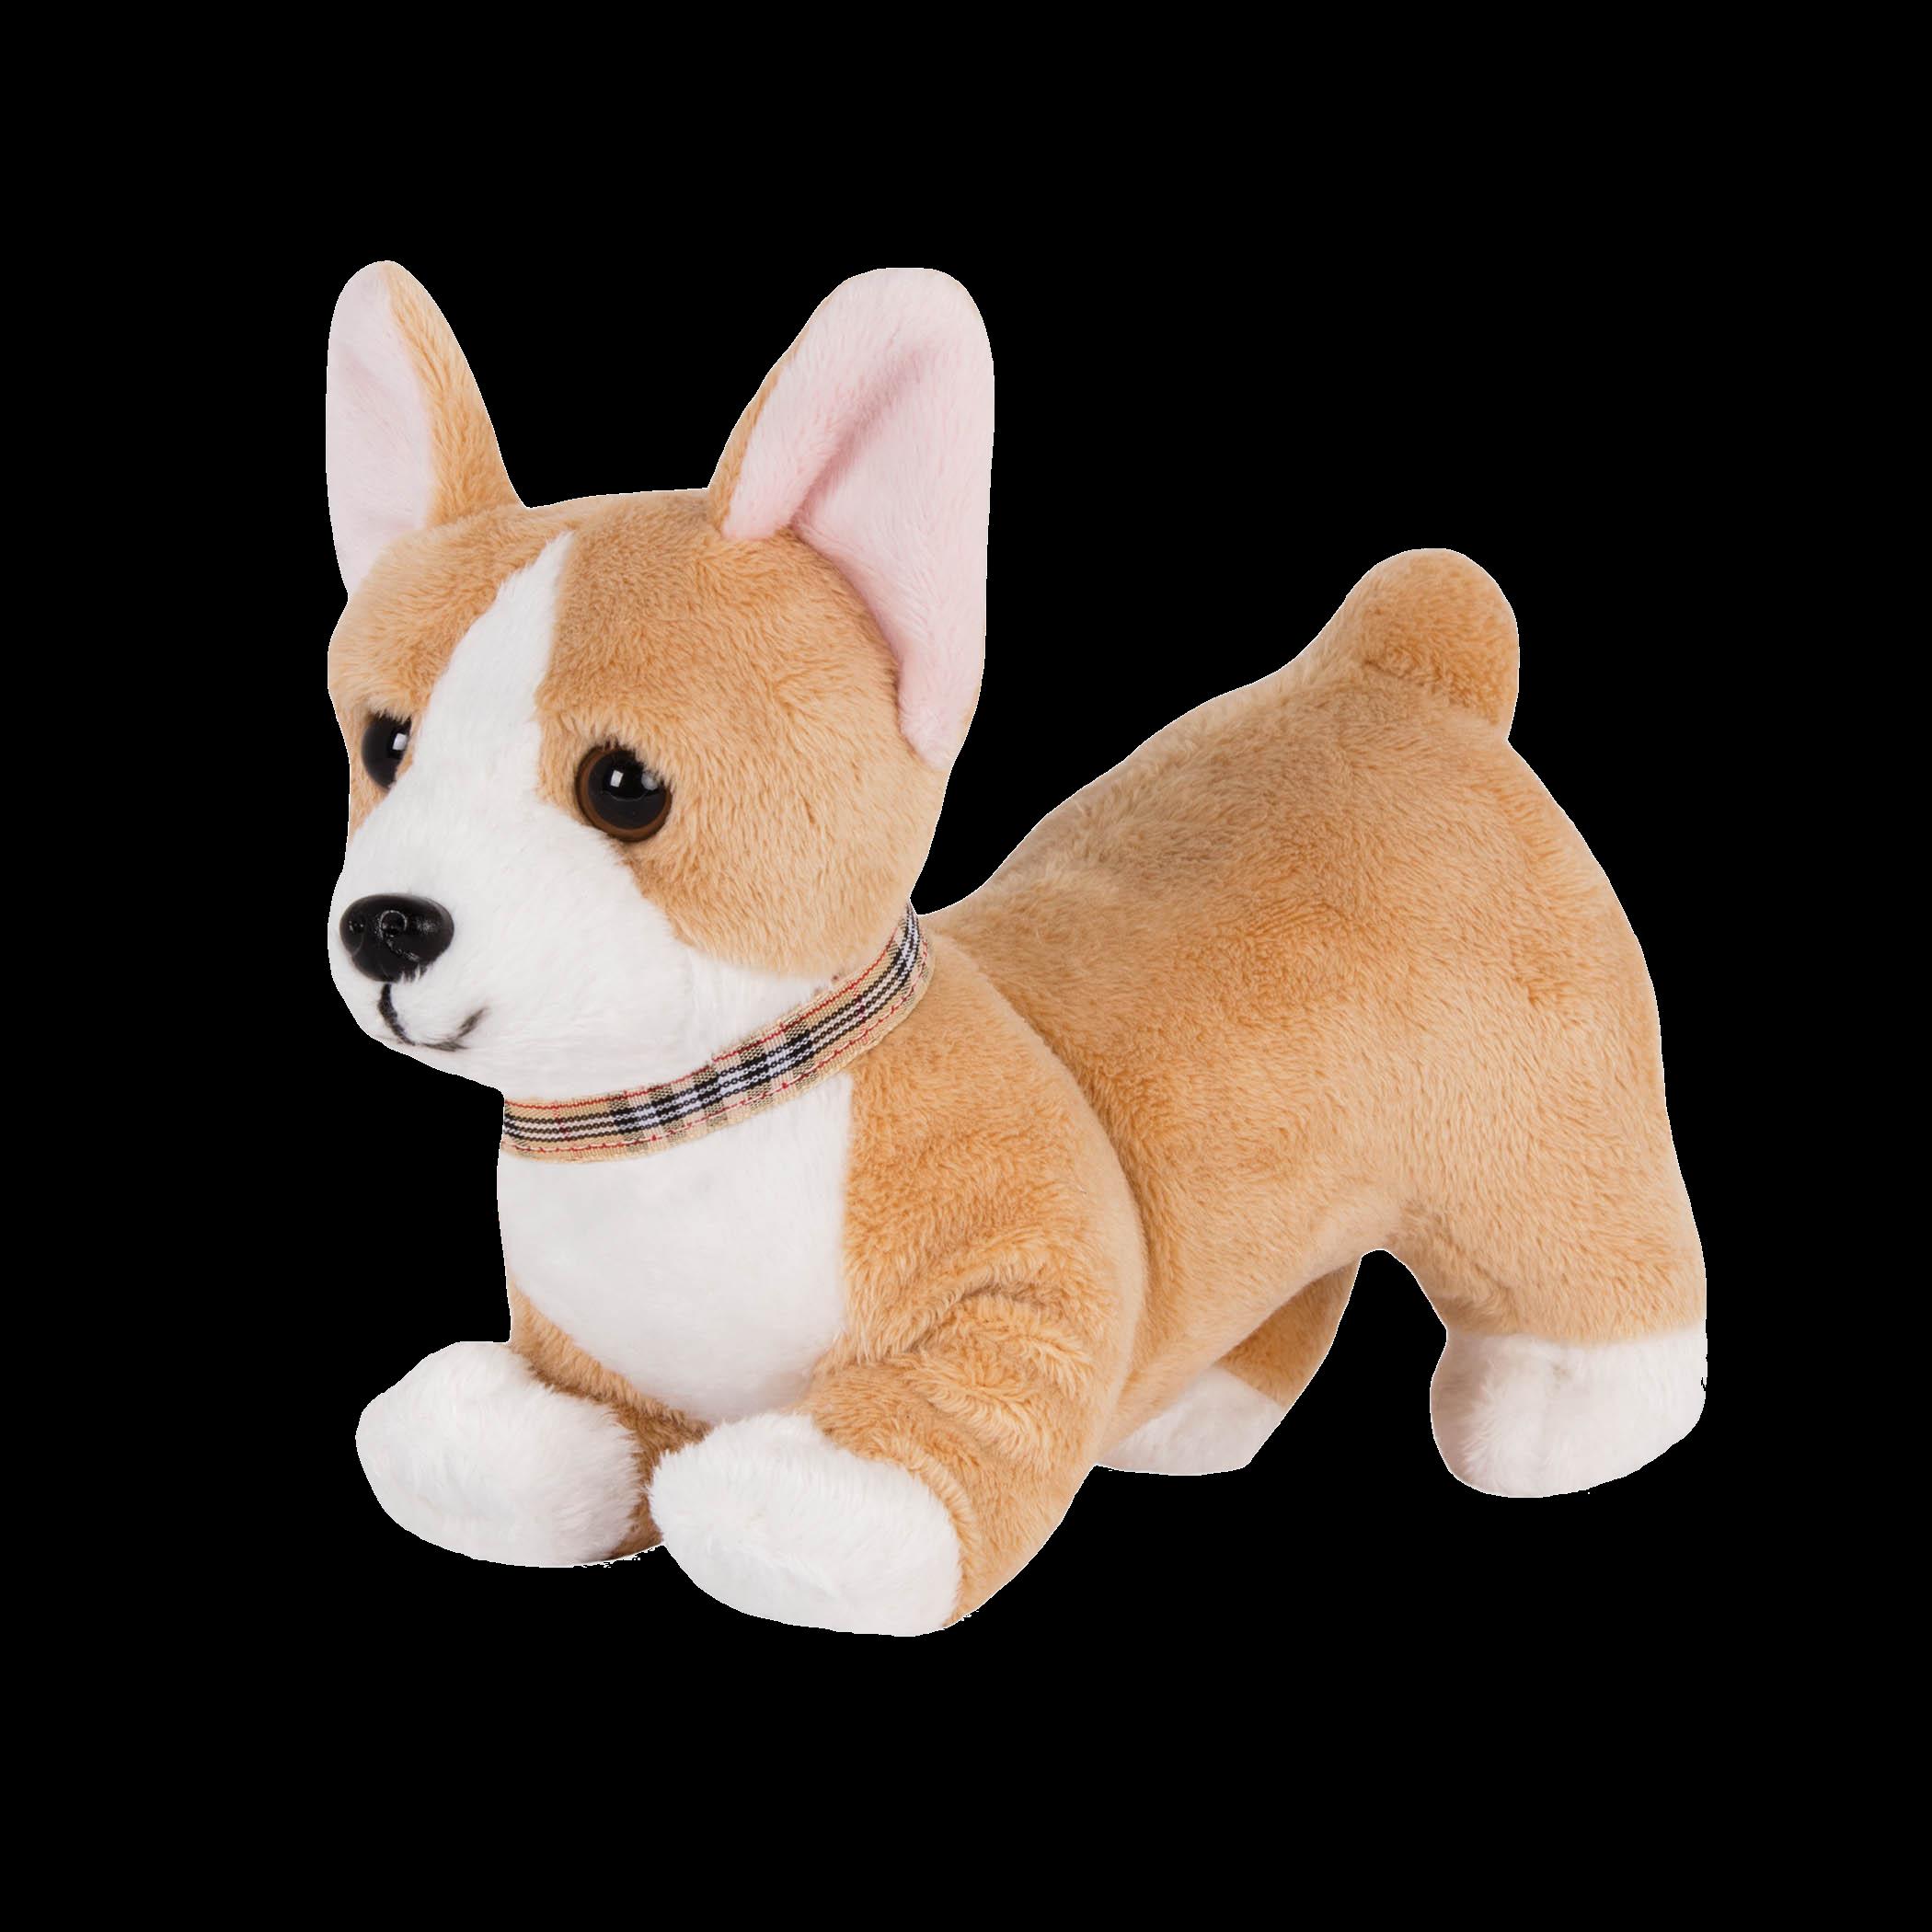 Posable Corgi Pup 6-inch Toy Dog